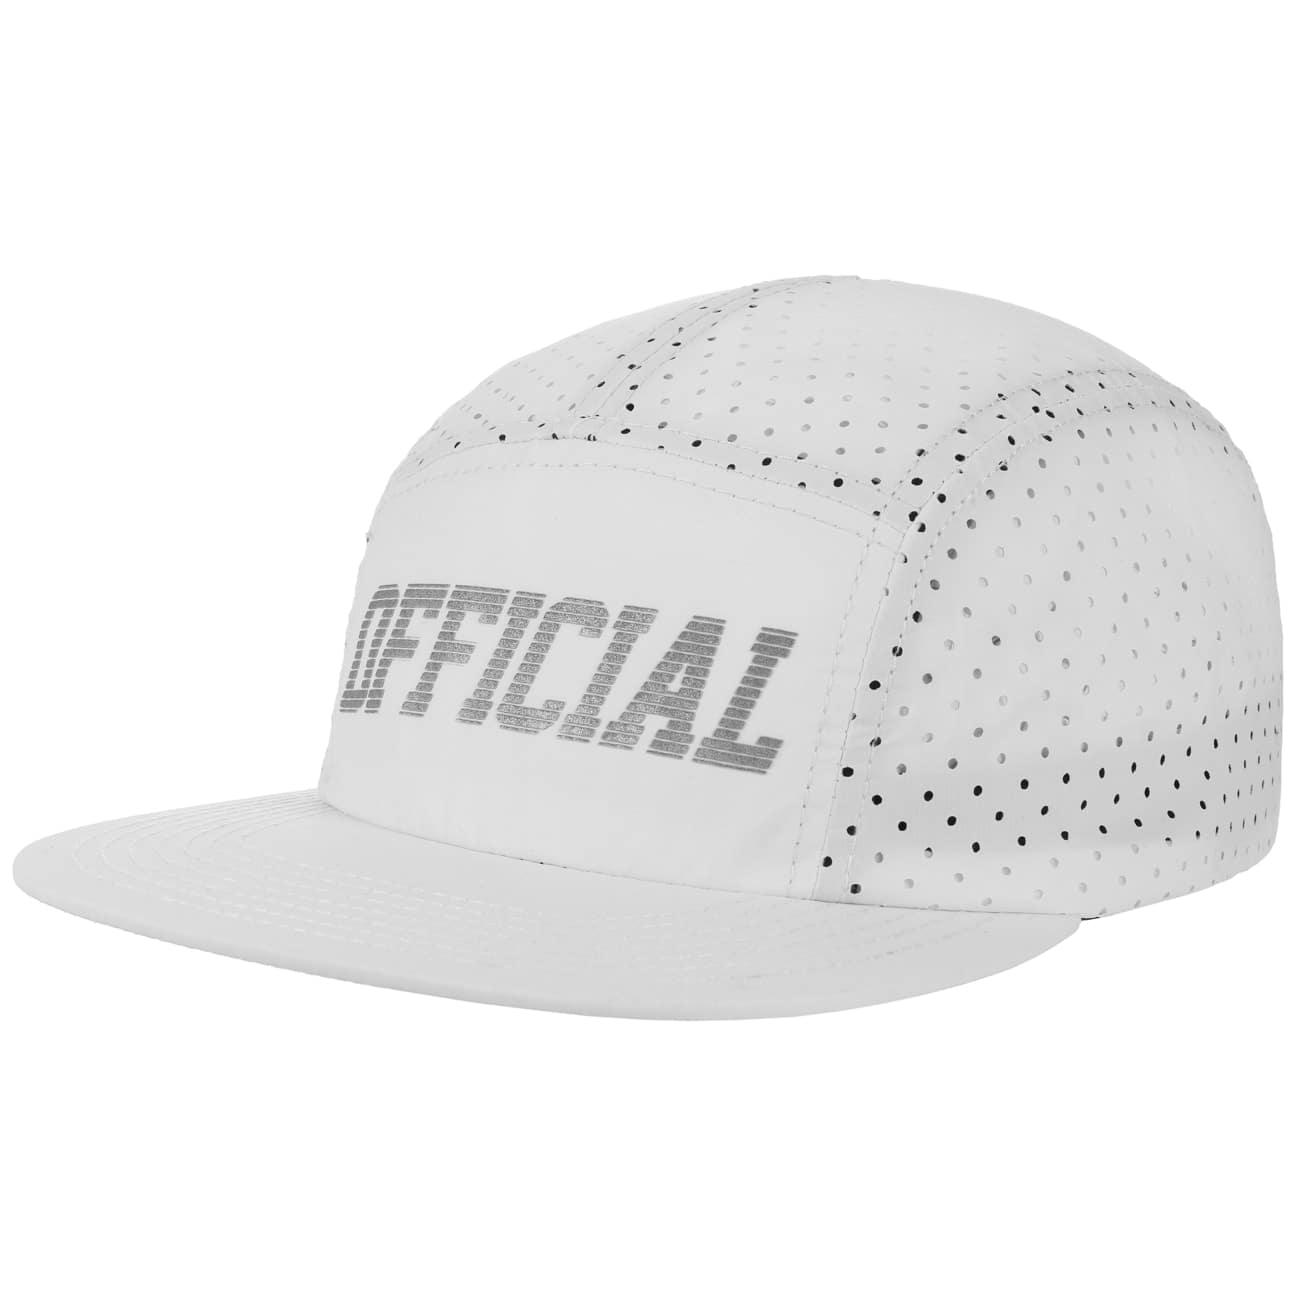 Aero Casquette Strapback by Official Headwear  baseball cap